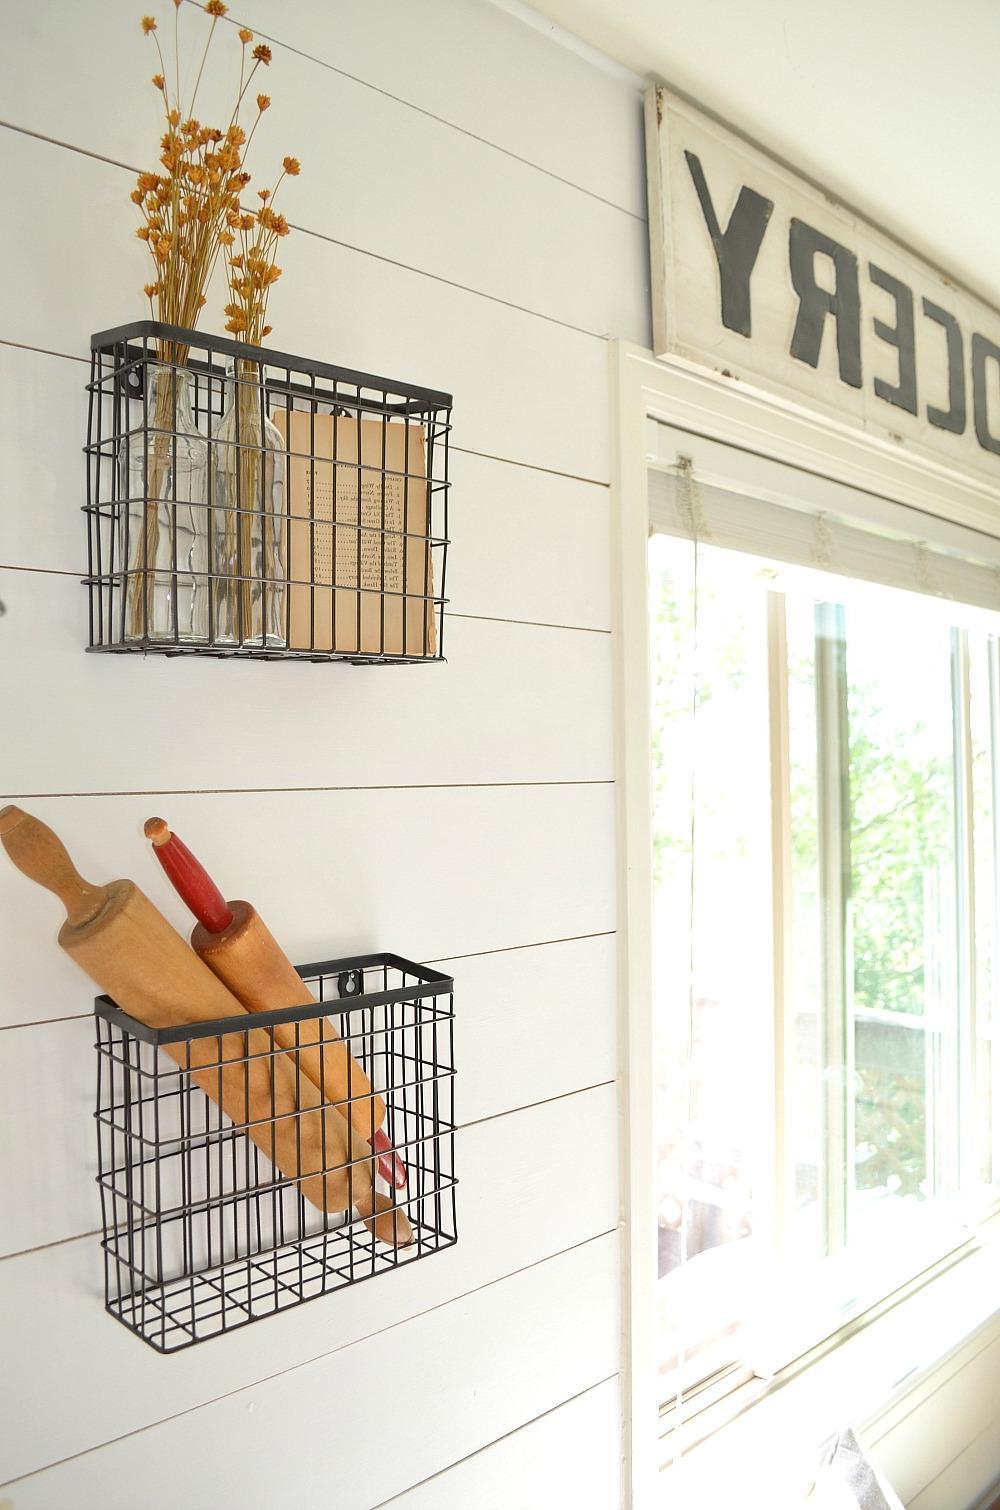 Hanging Baskets for Farmhouse Kitchen Decoration